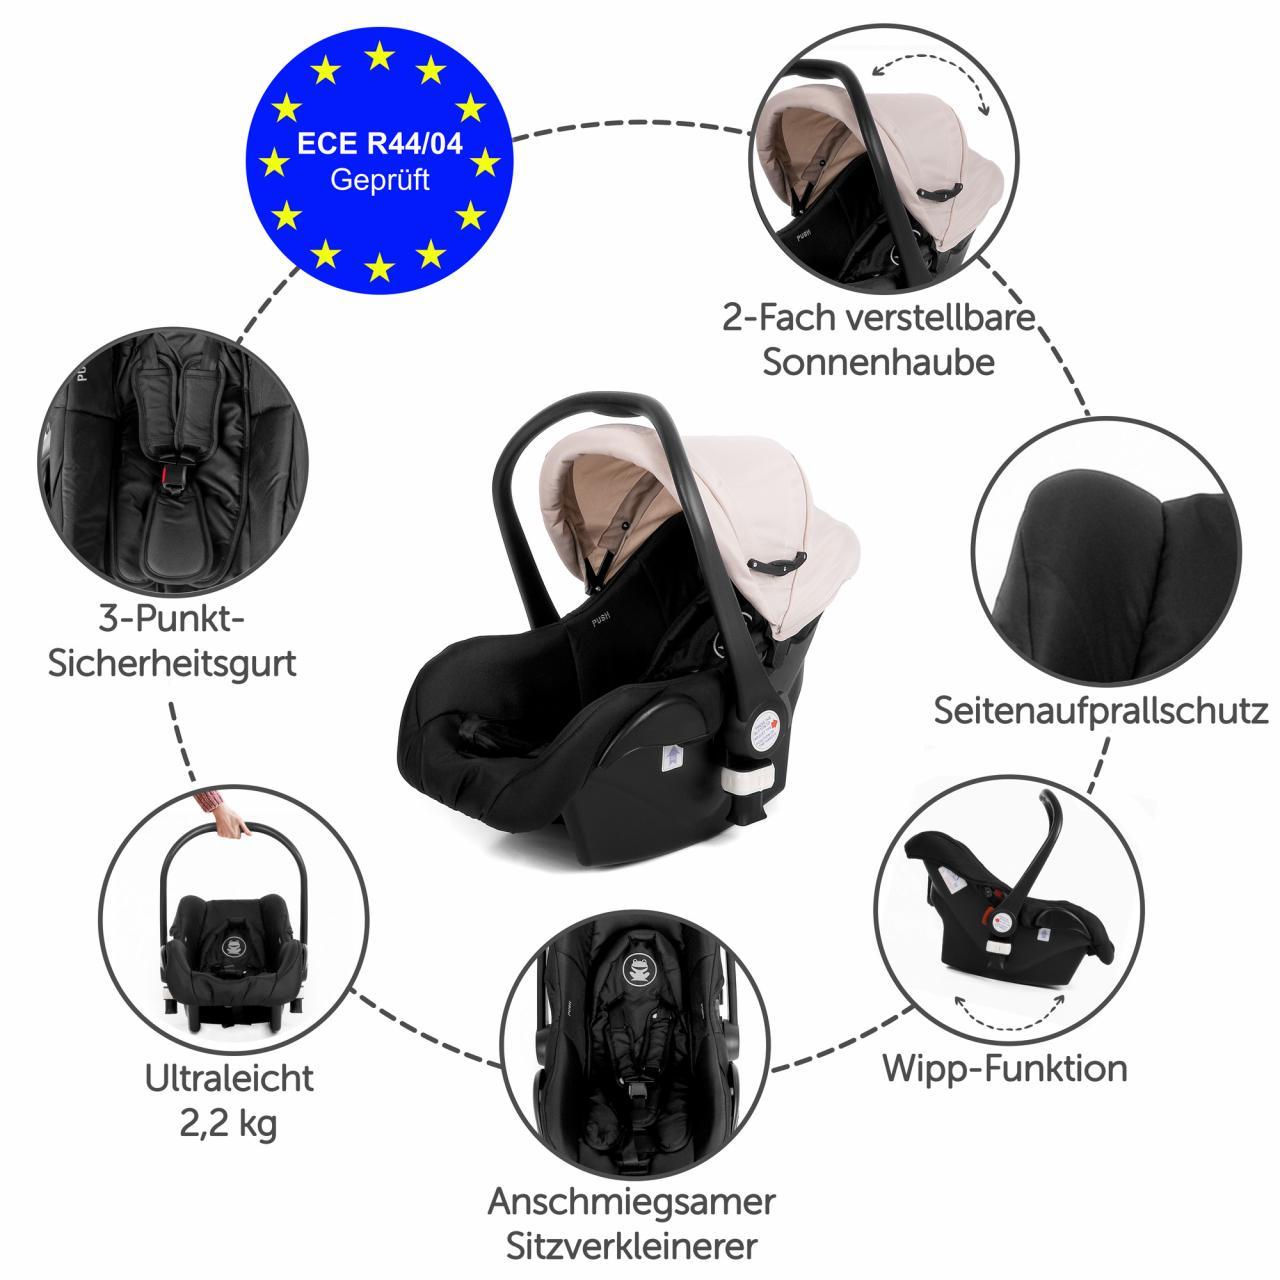 COCOON-Autositz-Babyschale-Kindersitz-Baby-Kinder-Kinderwagen-Auto-Babysitz